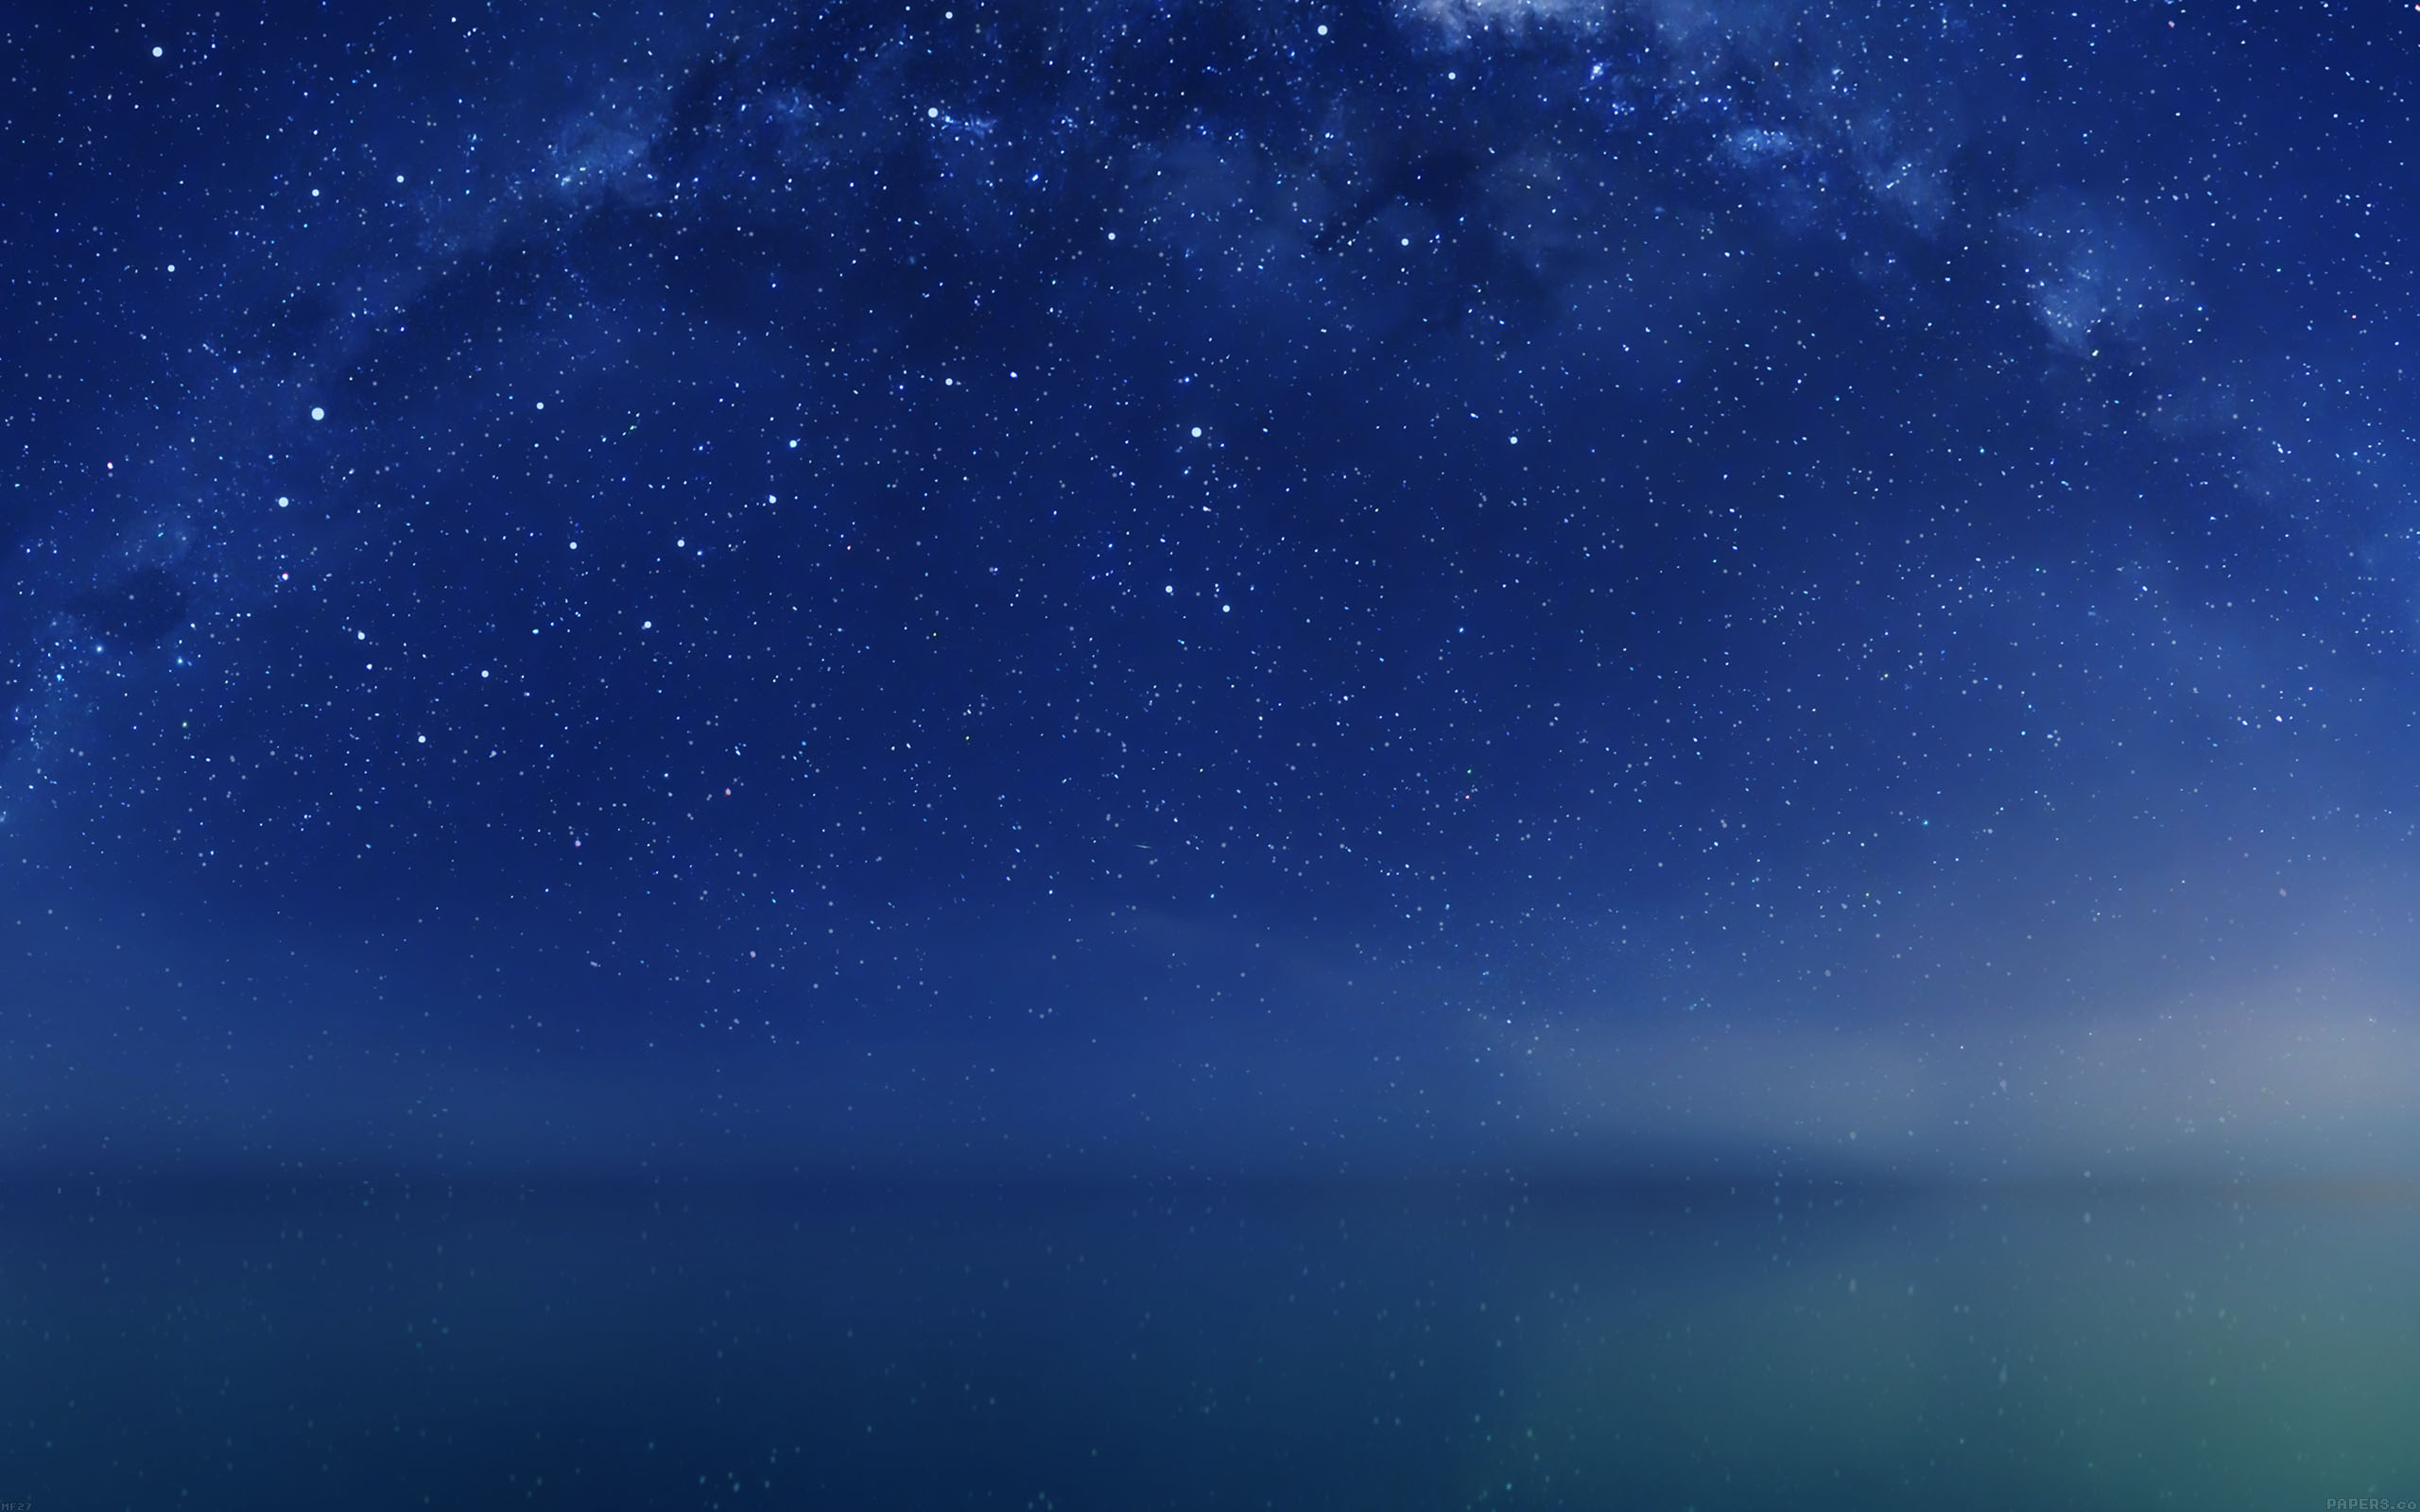 starry night essay  essay on vincent van gogh s starry night